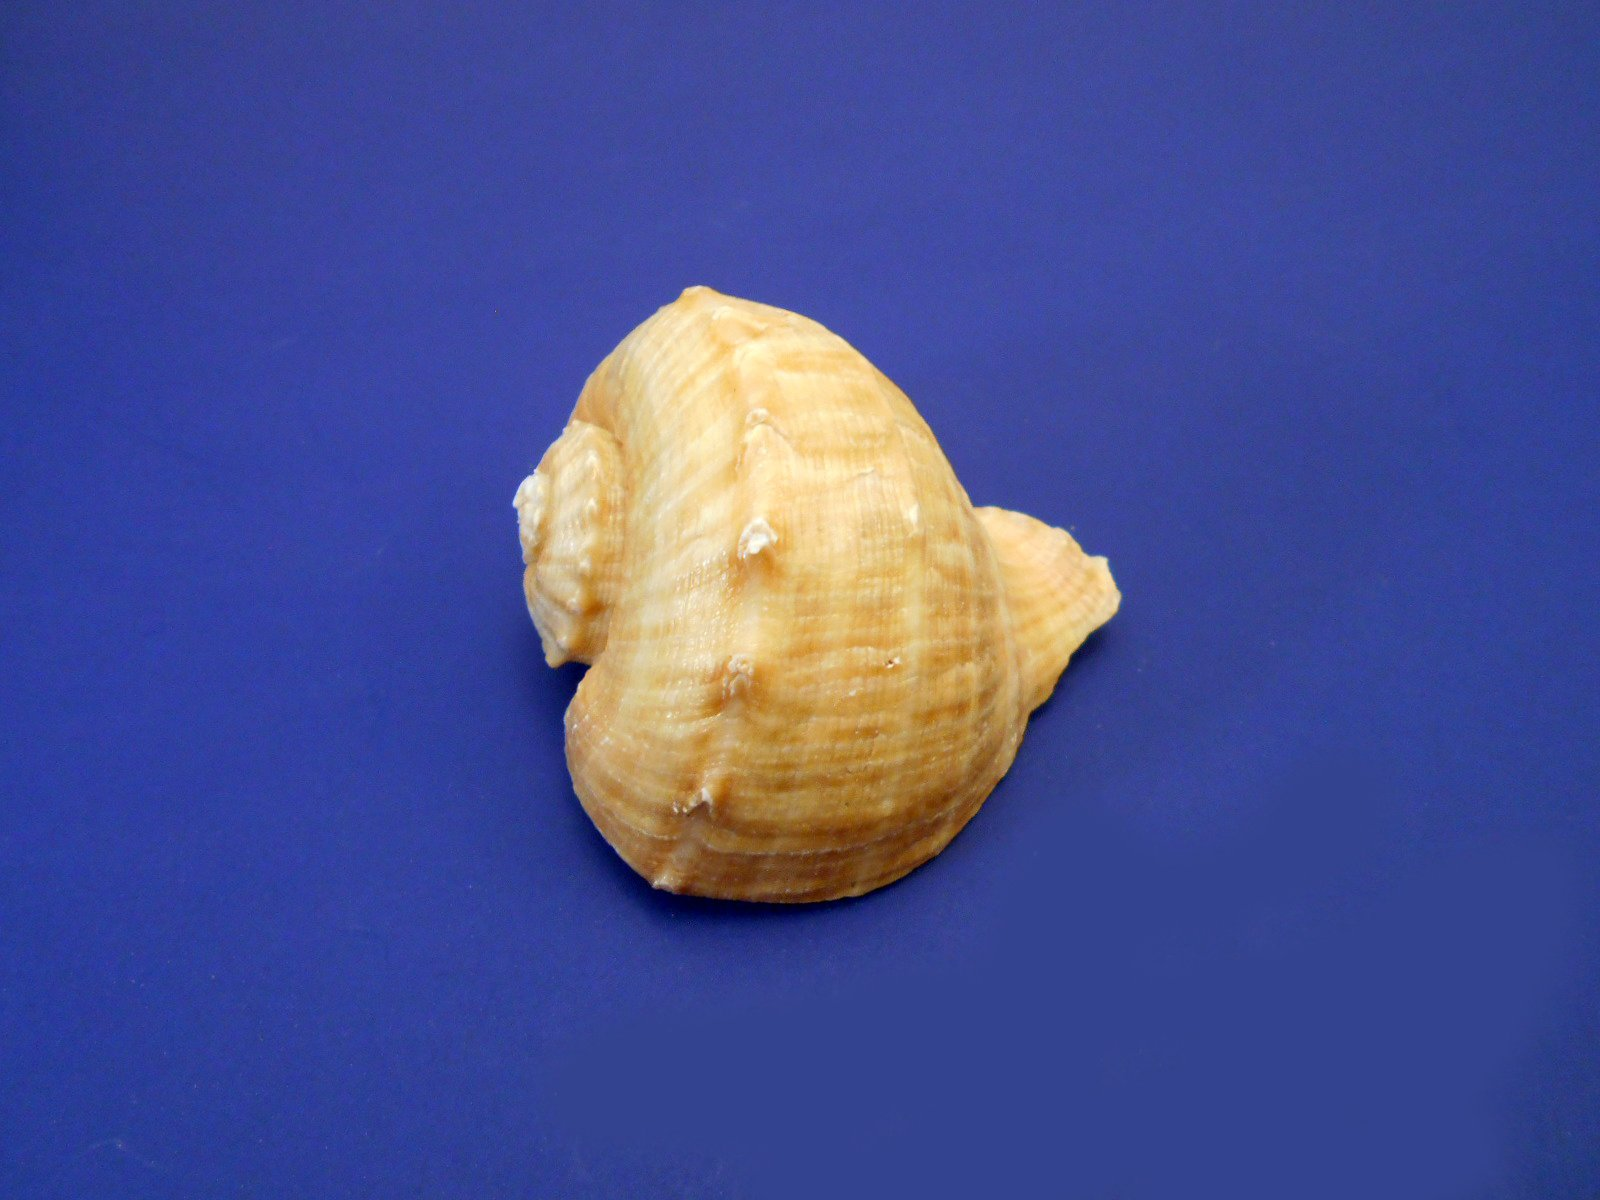 "Florida Shells and Gifts Inc. 6 Large Rapana Whelk Shells Seashells 2"" - 3"" Sea Shell Hermit Crab Beach Nautical"